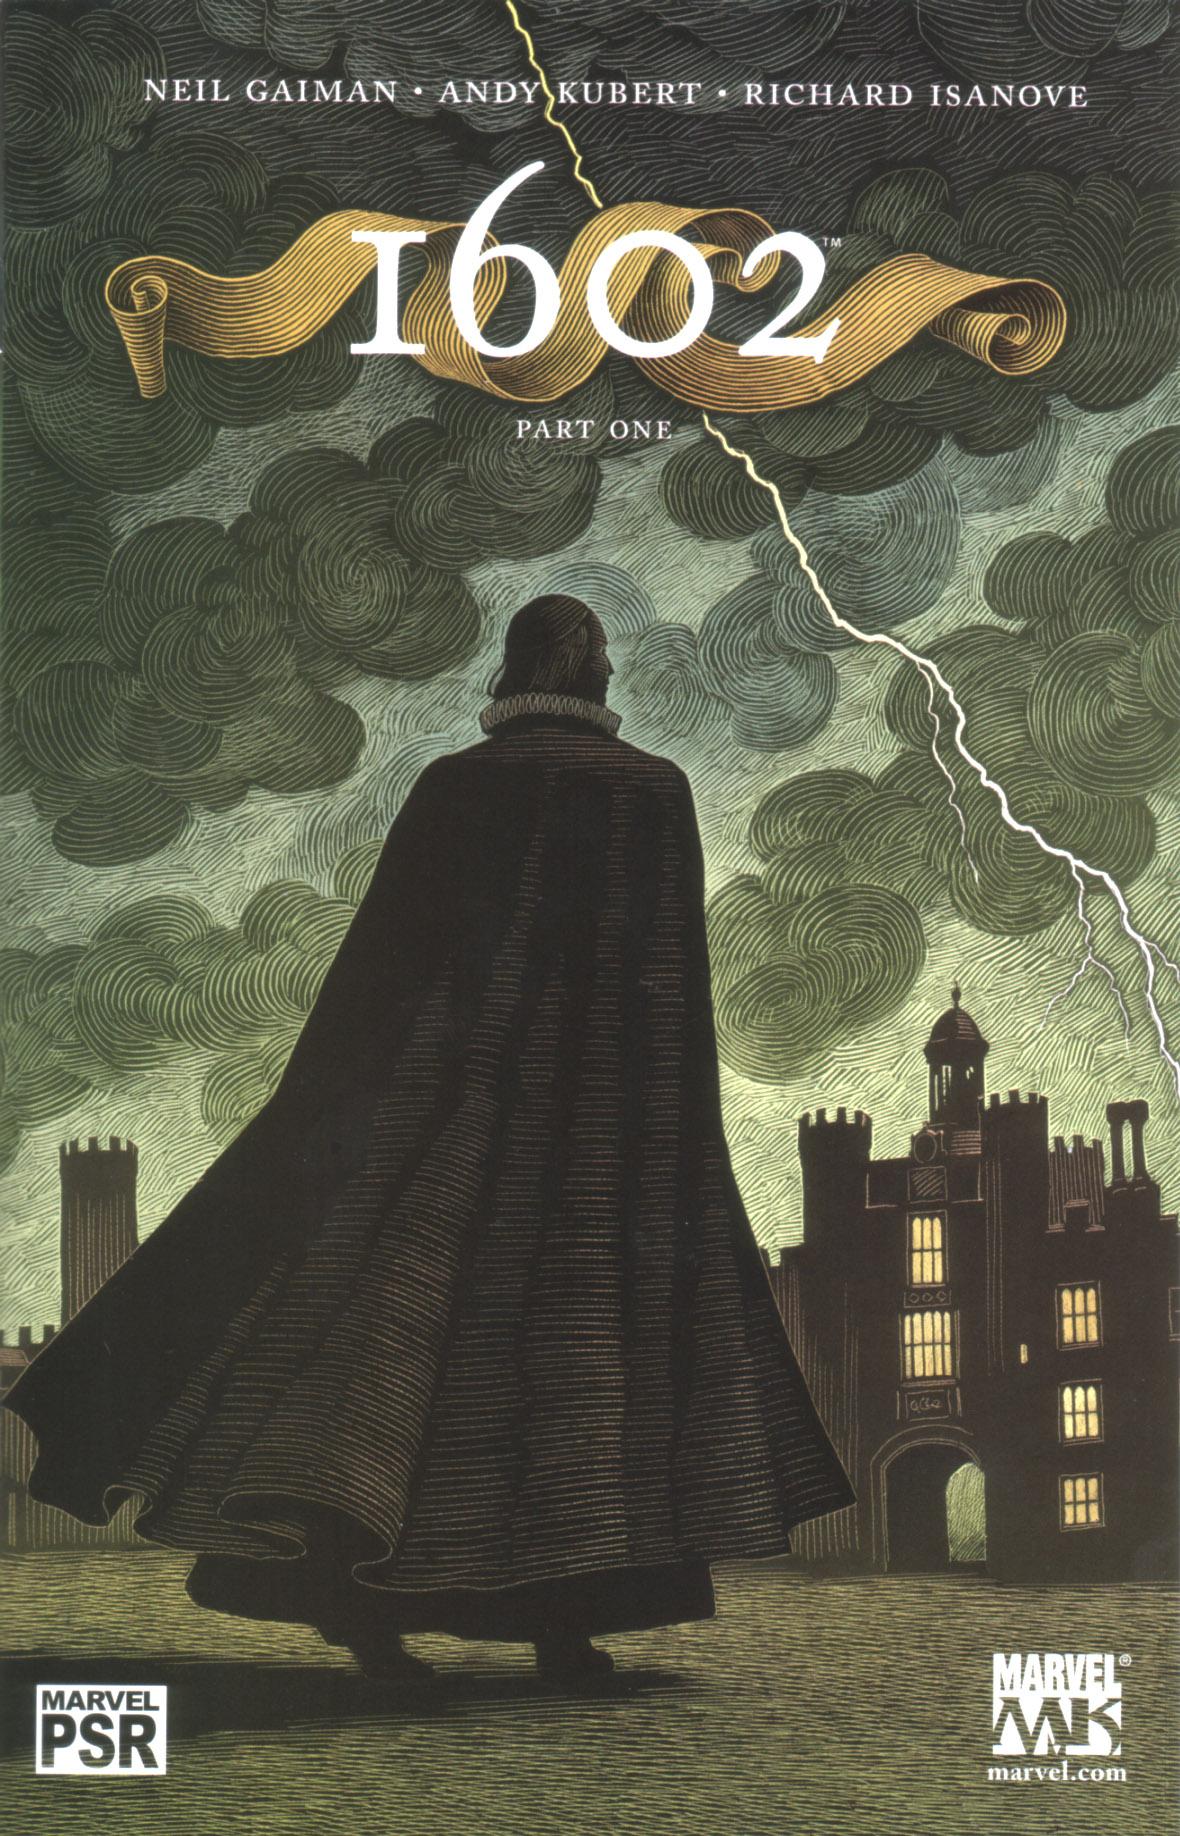 Gaiman: Marvel 1602